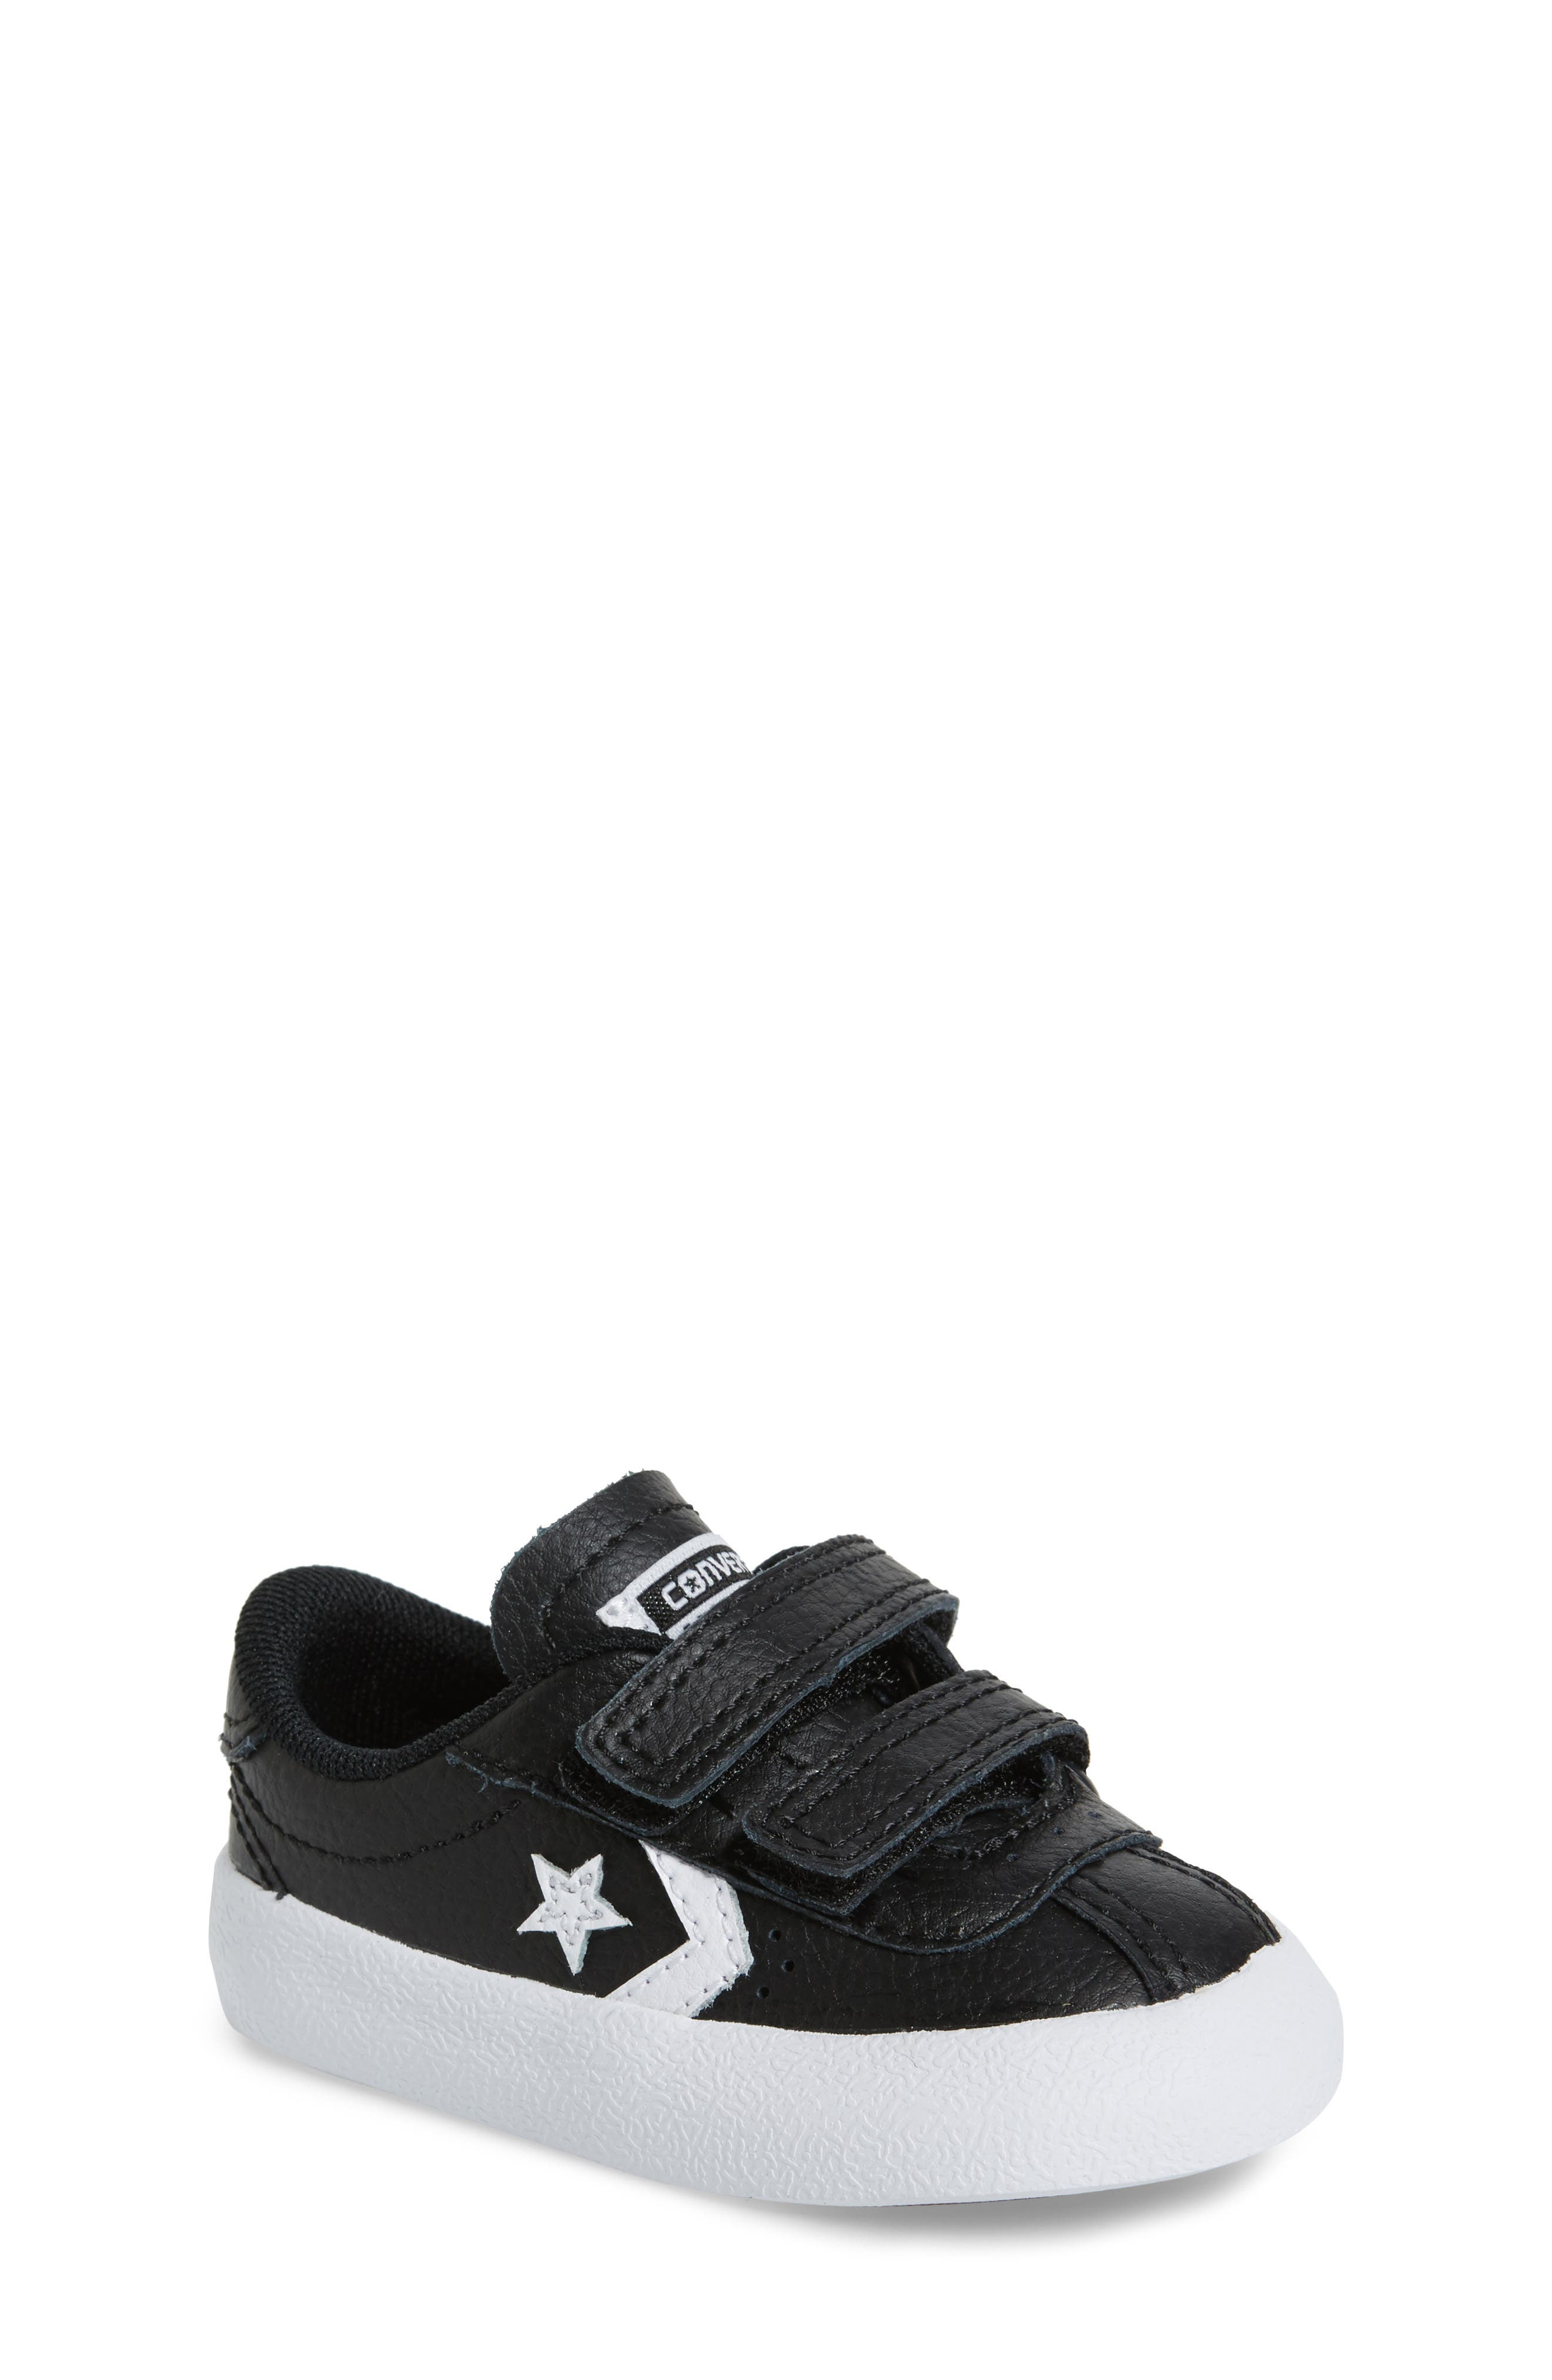 Breakpoint Pro Sneaker,                         Main,                         color, 001